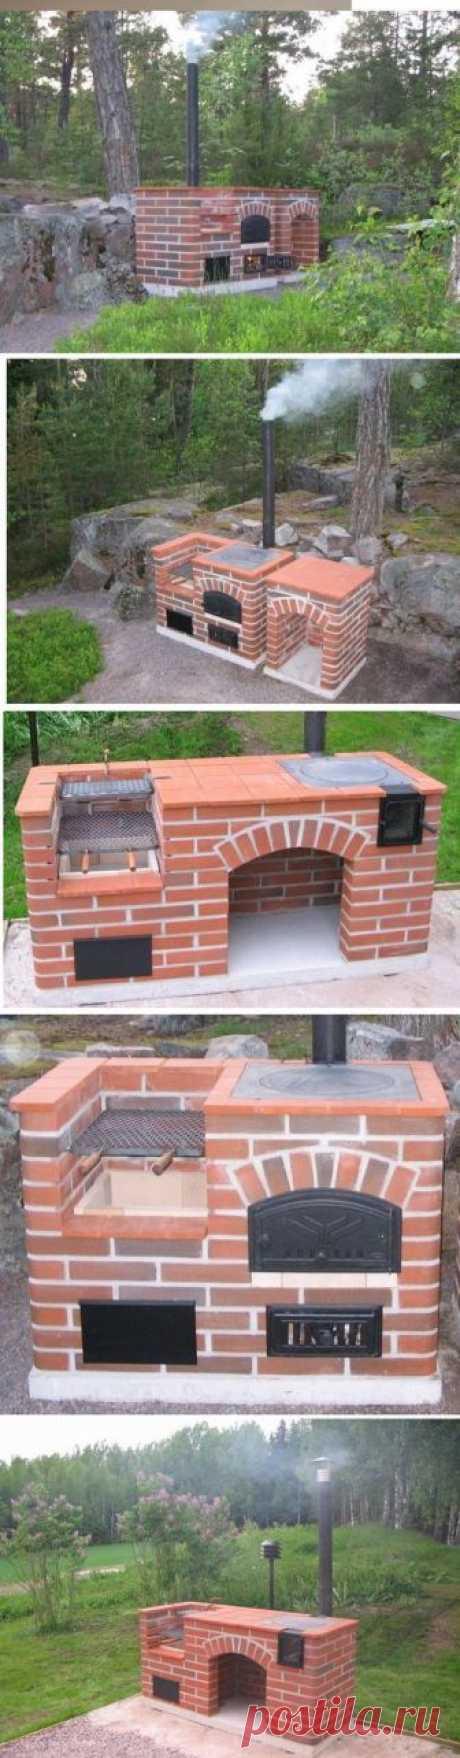 street furnace brick